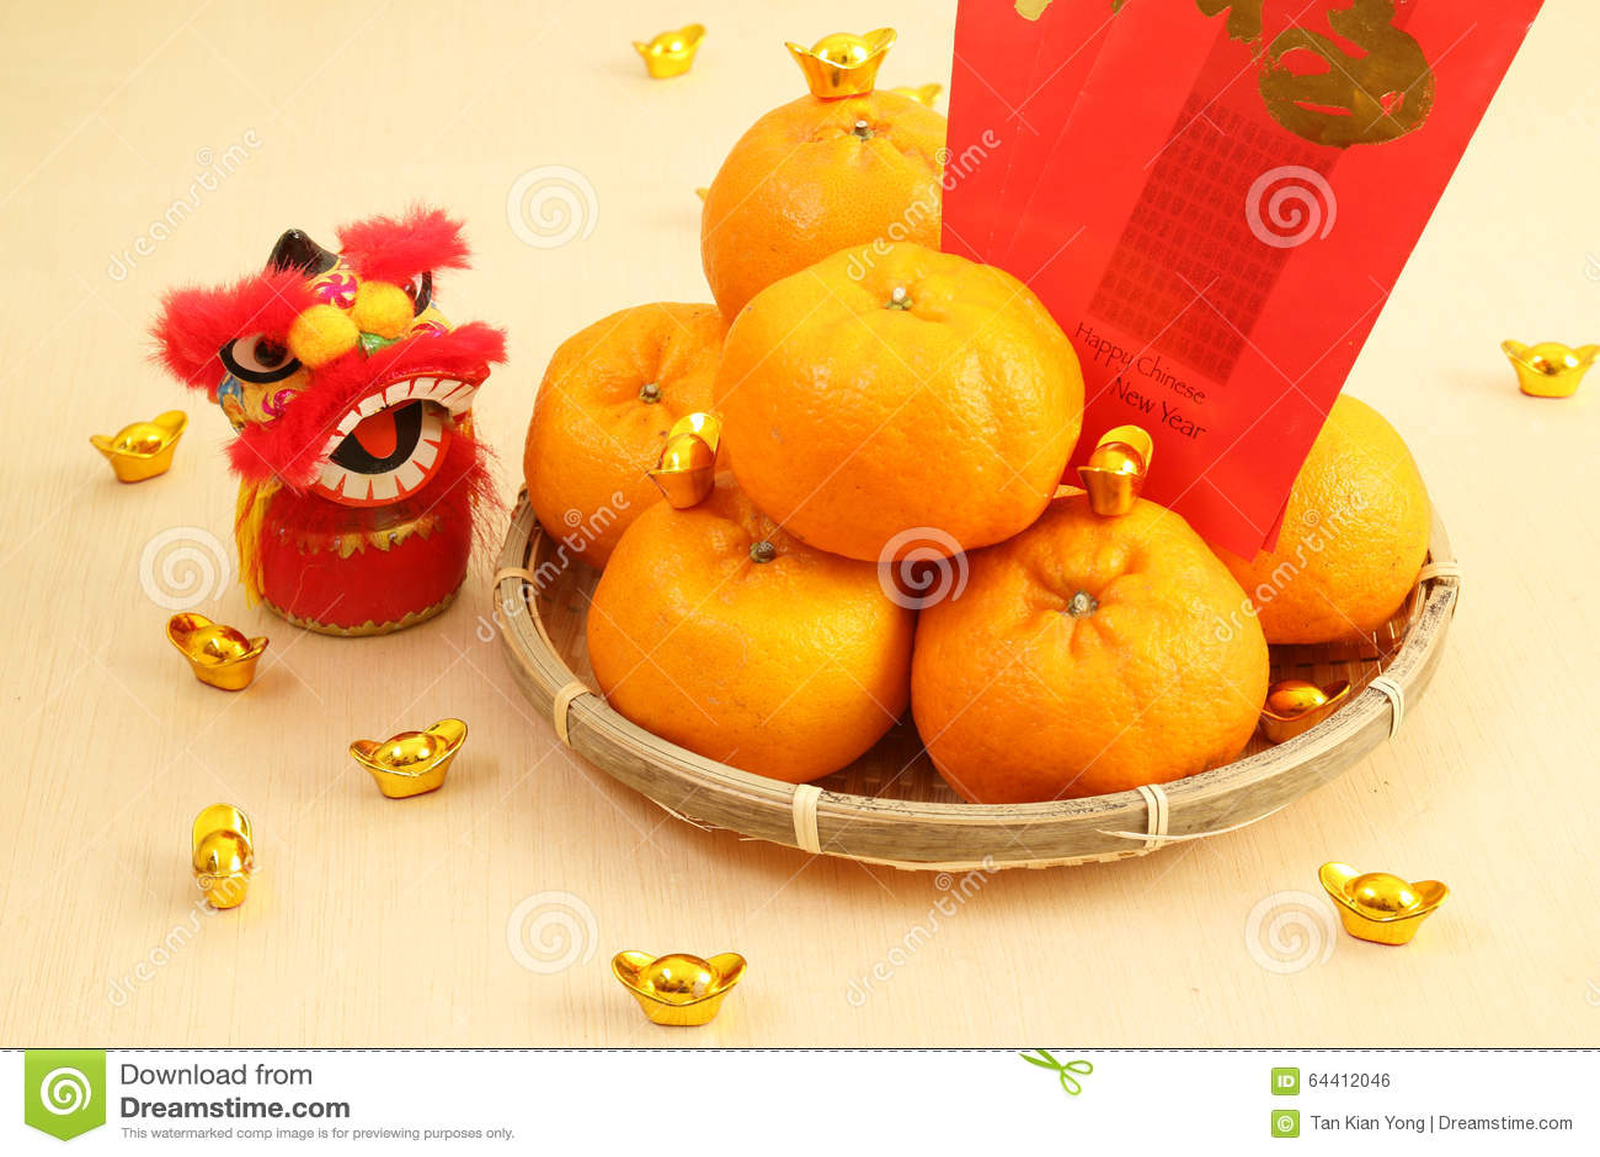 how to write the year in mandarin